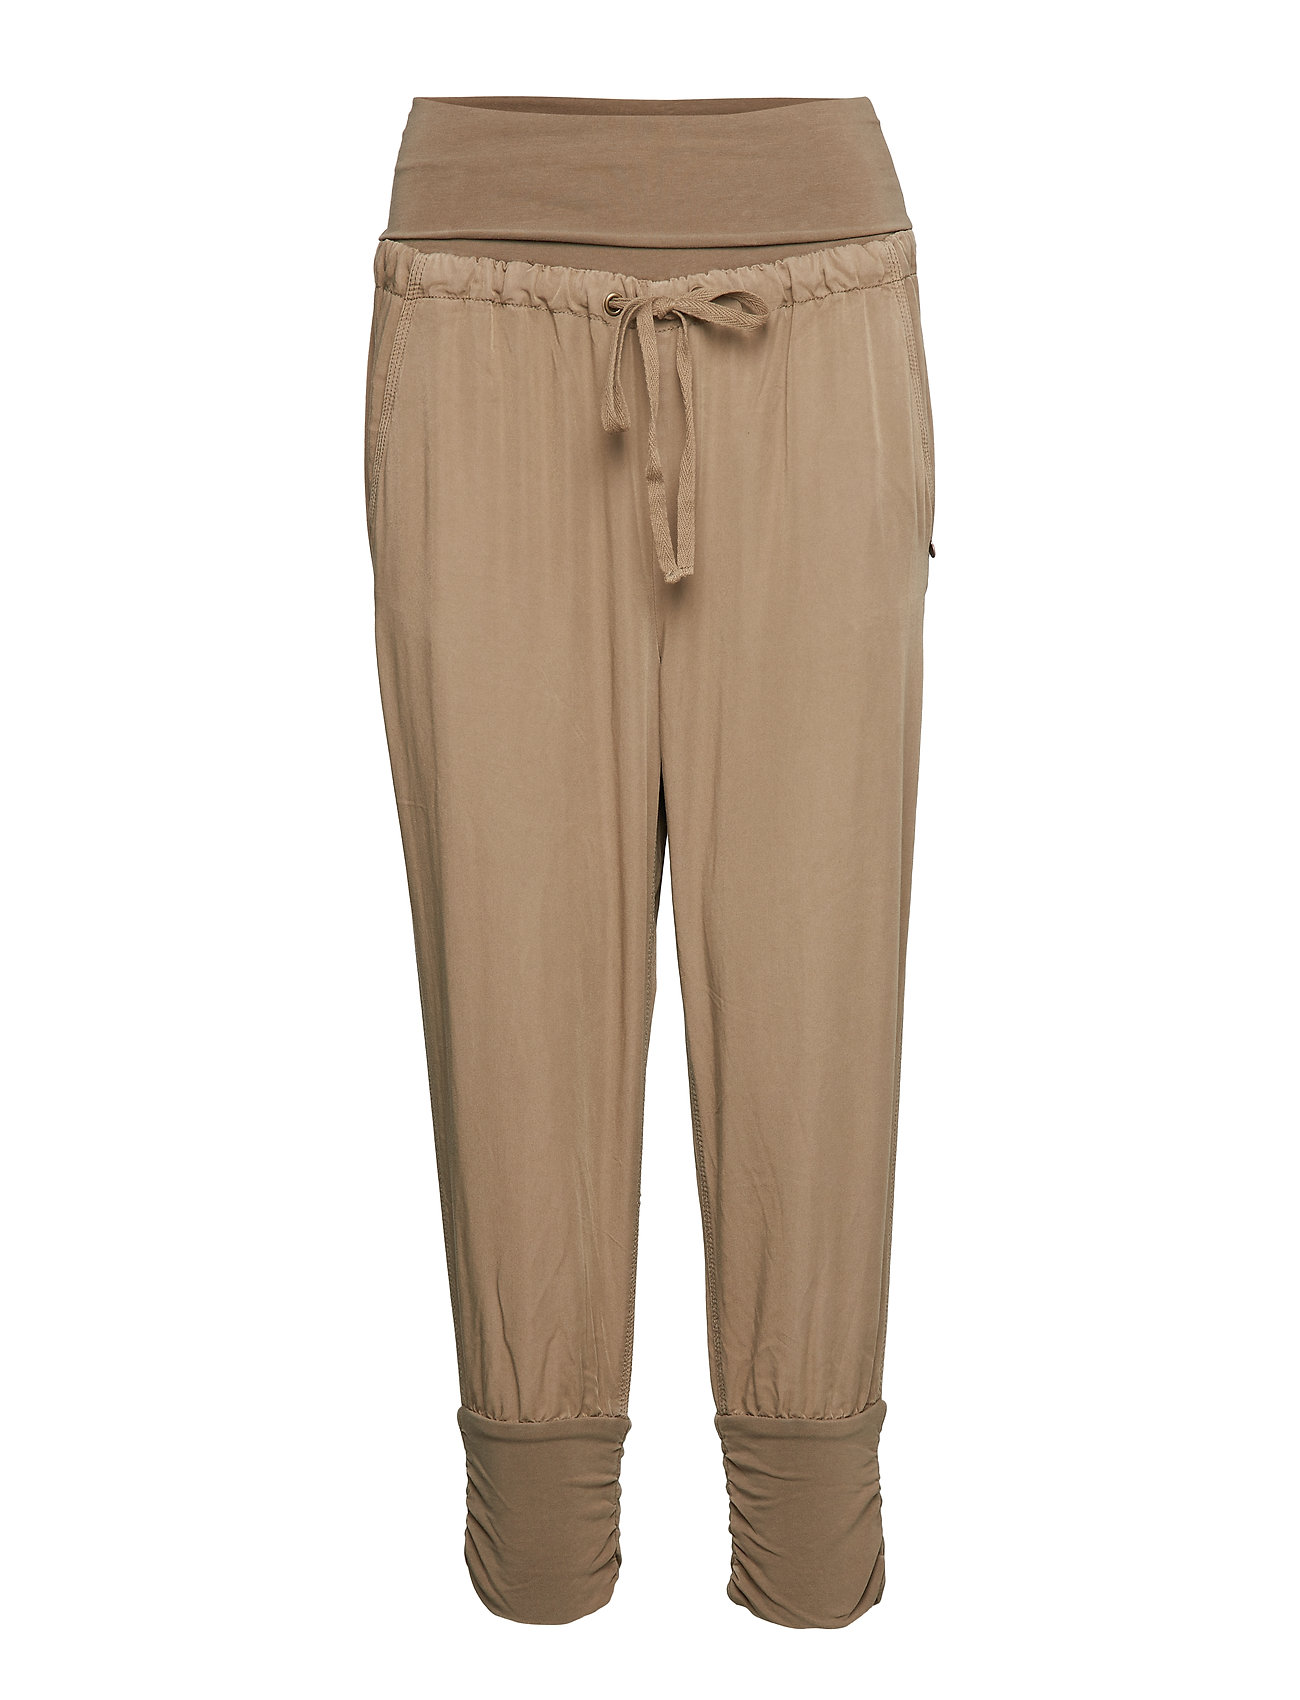 34d108be3918 Line Pants (Lead Grey) (£59.99) - Cream -